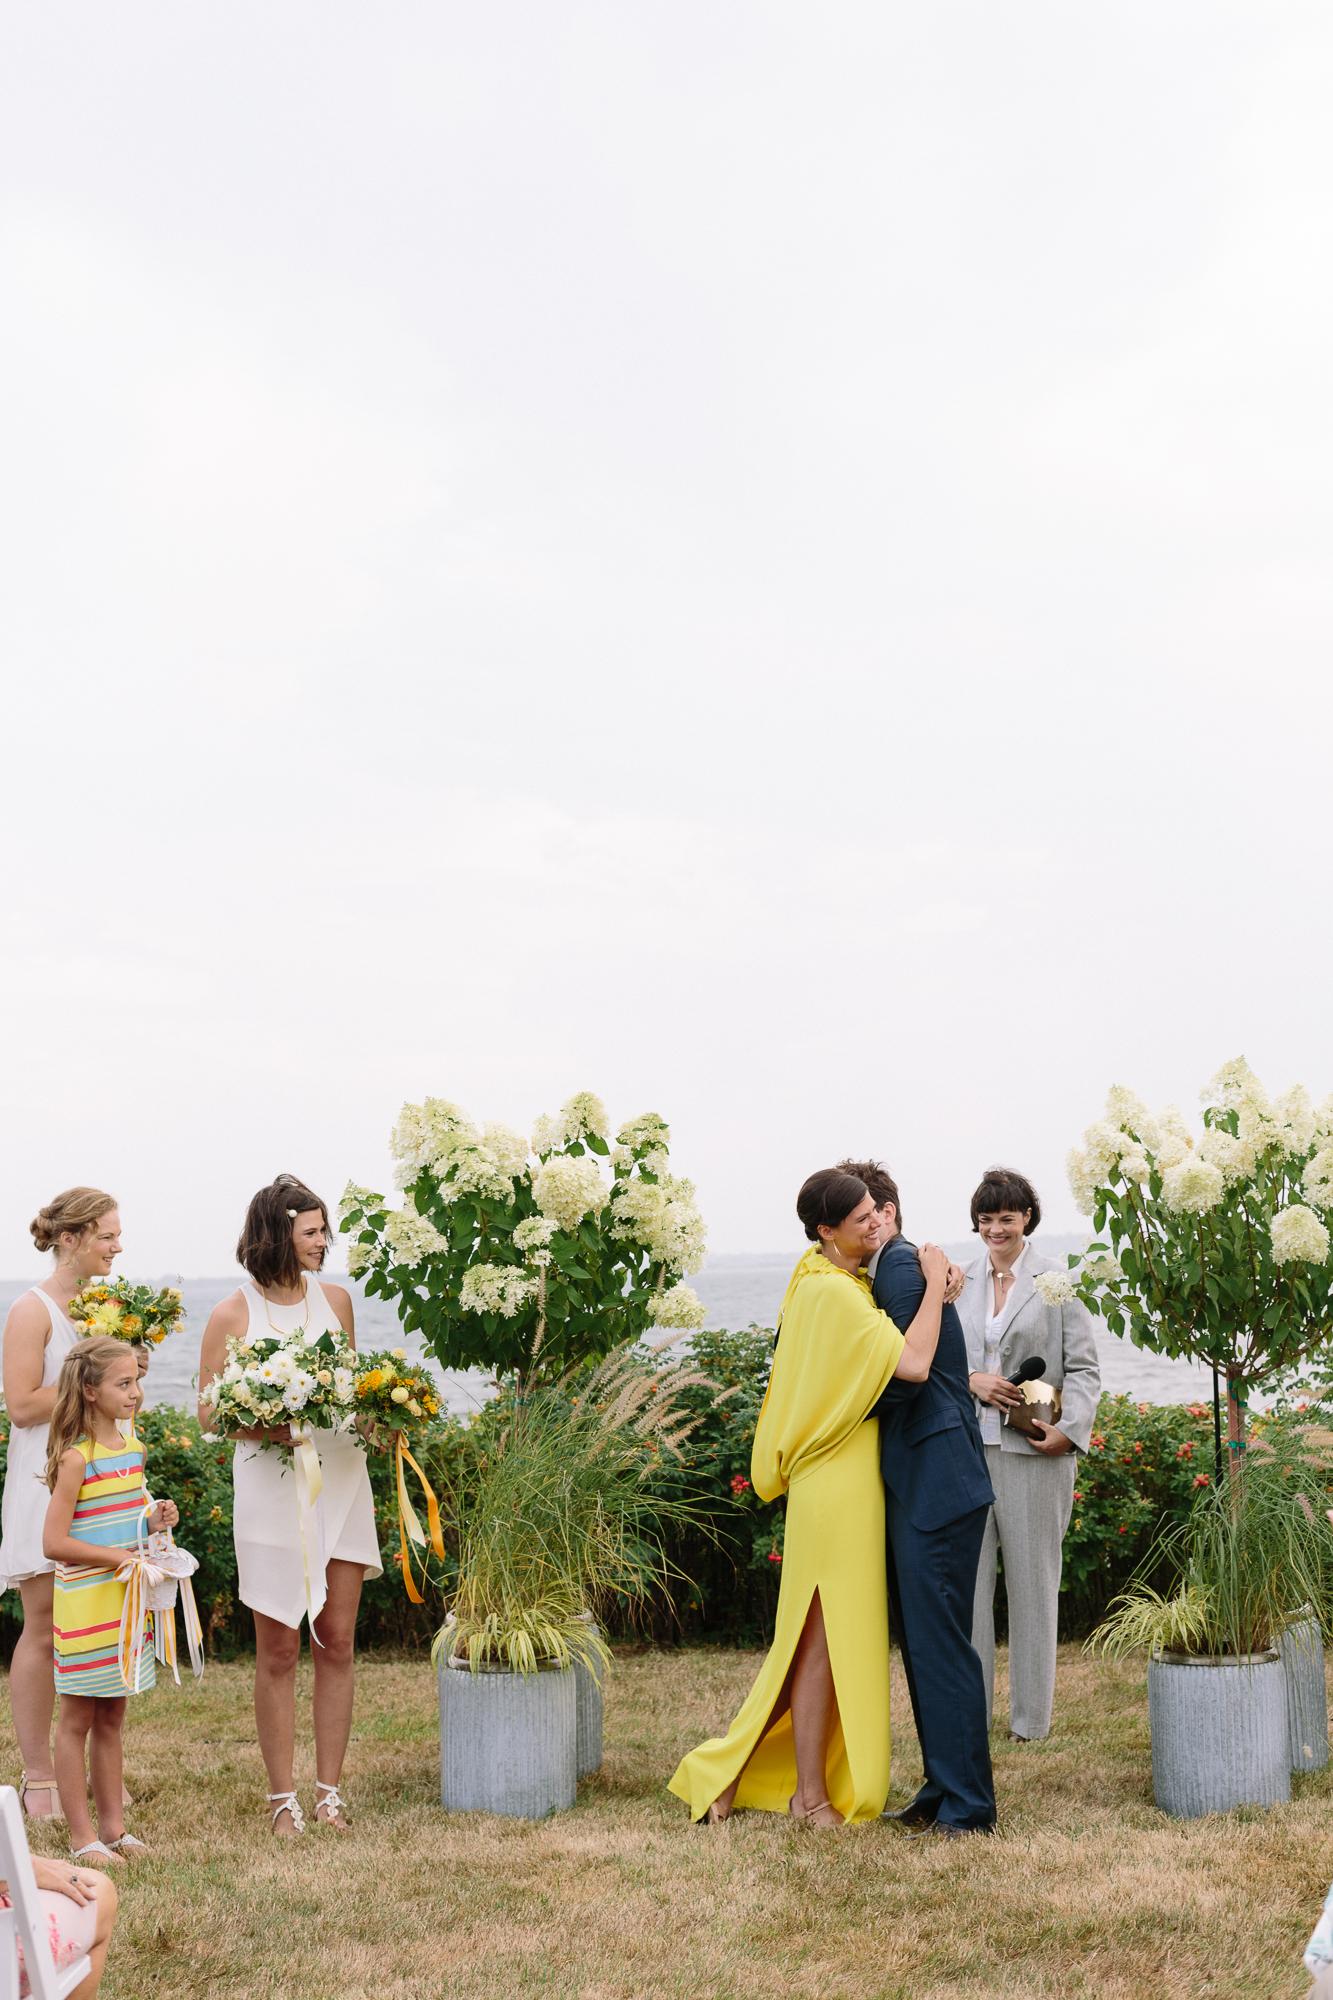 2016_City_Love_Photography_Rhode_Island_Wedding_Photography-62.jpg